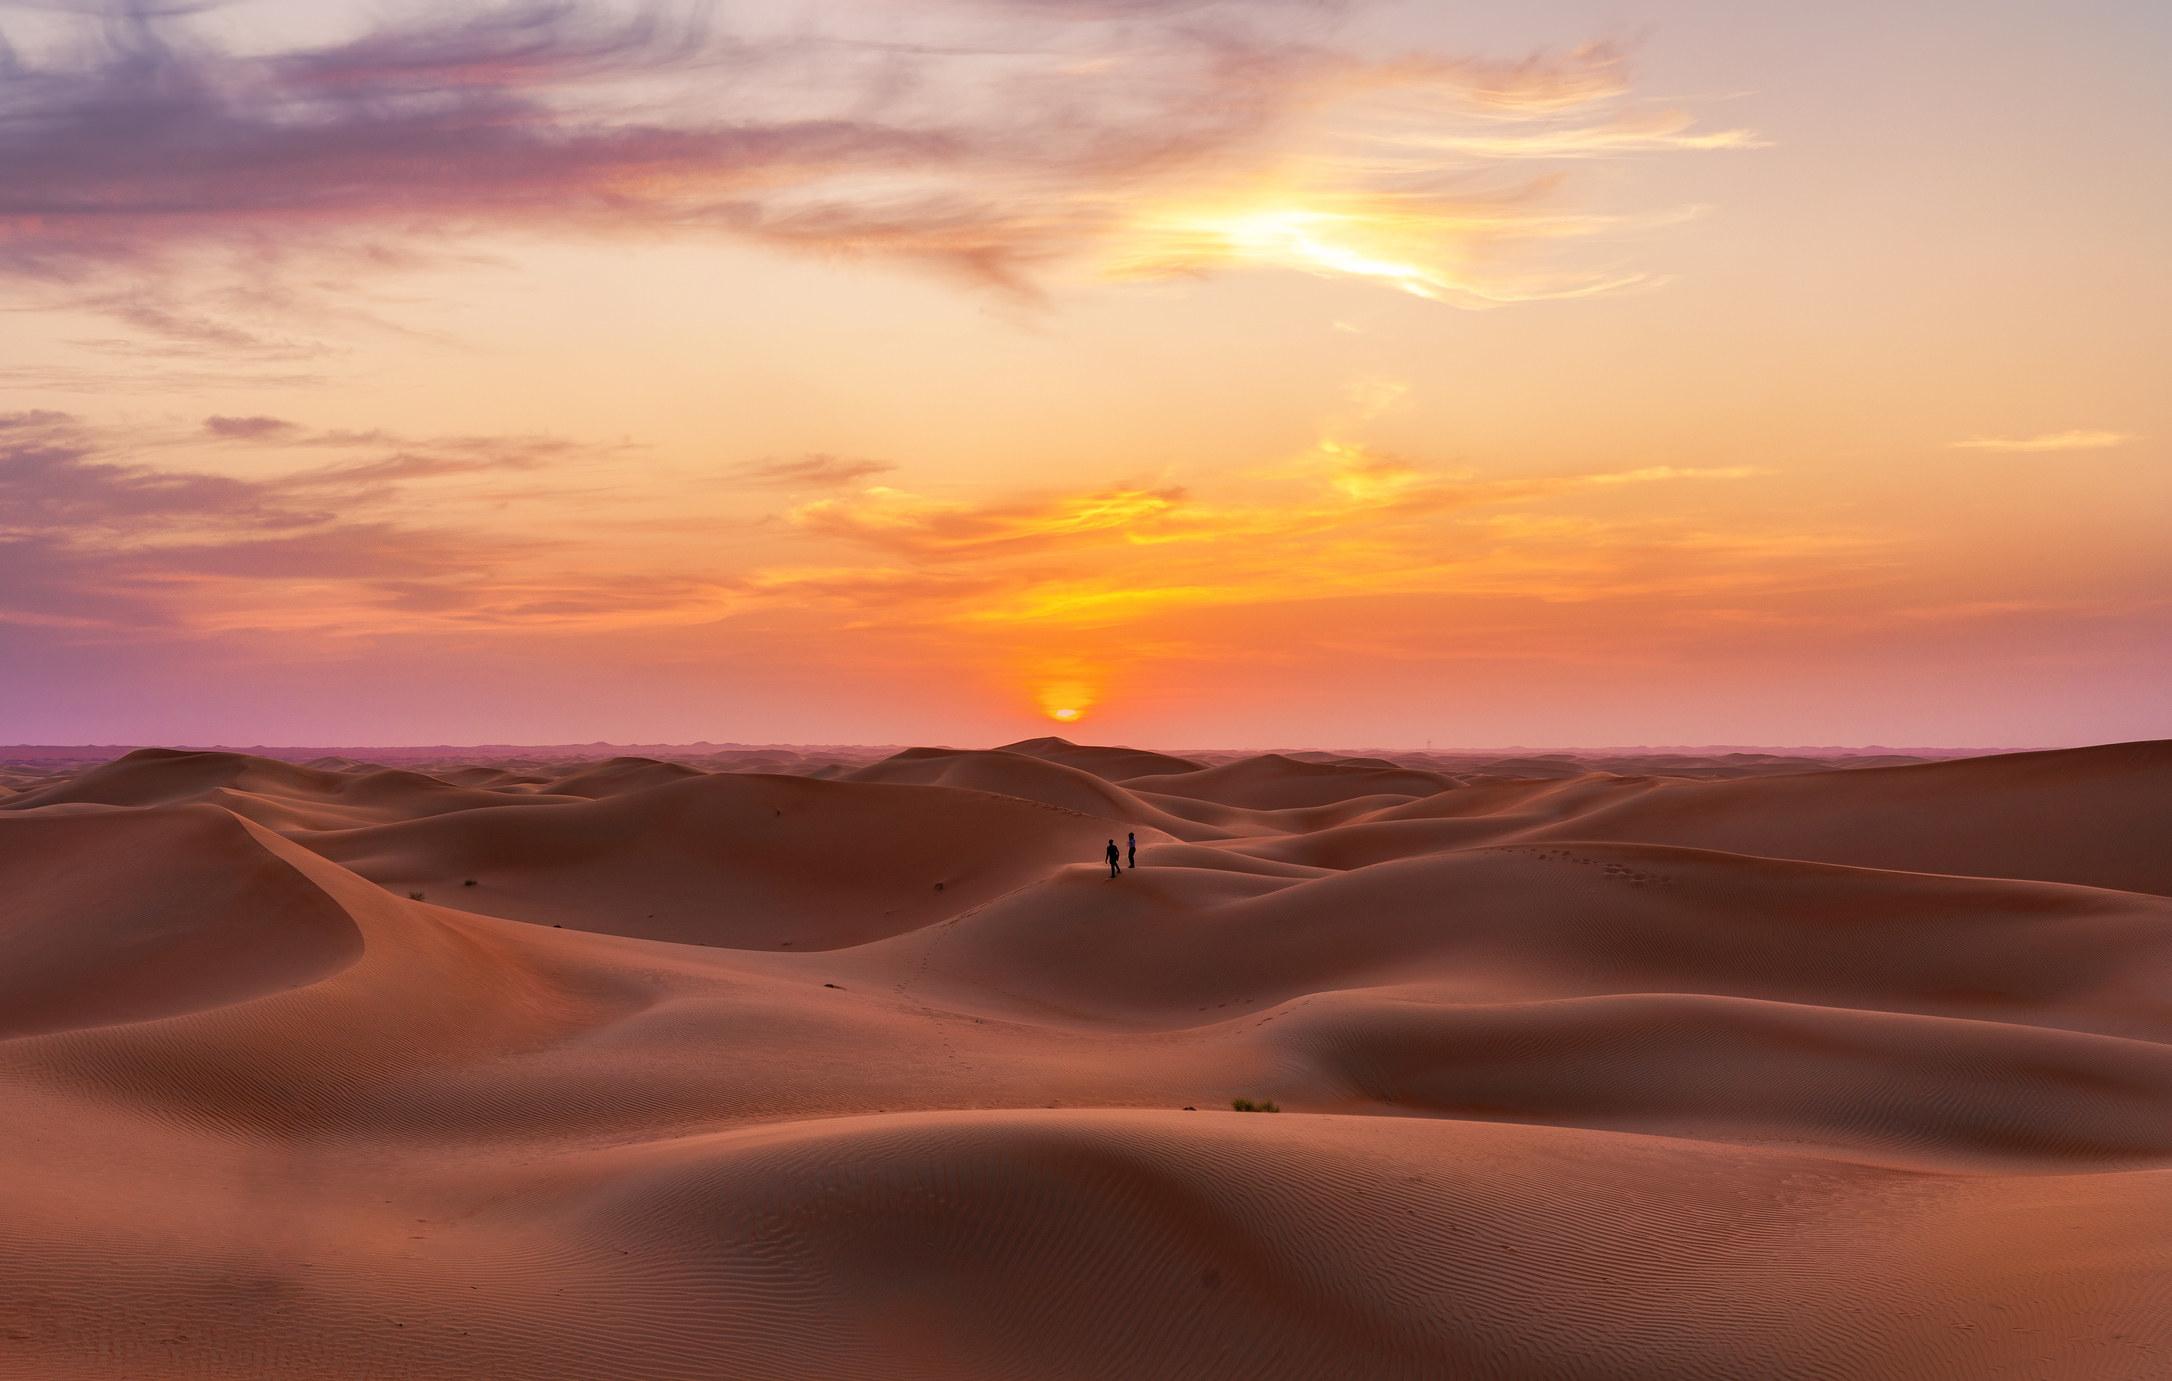 Open desert under orange sky